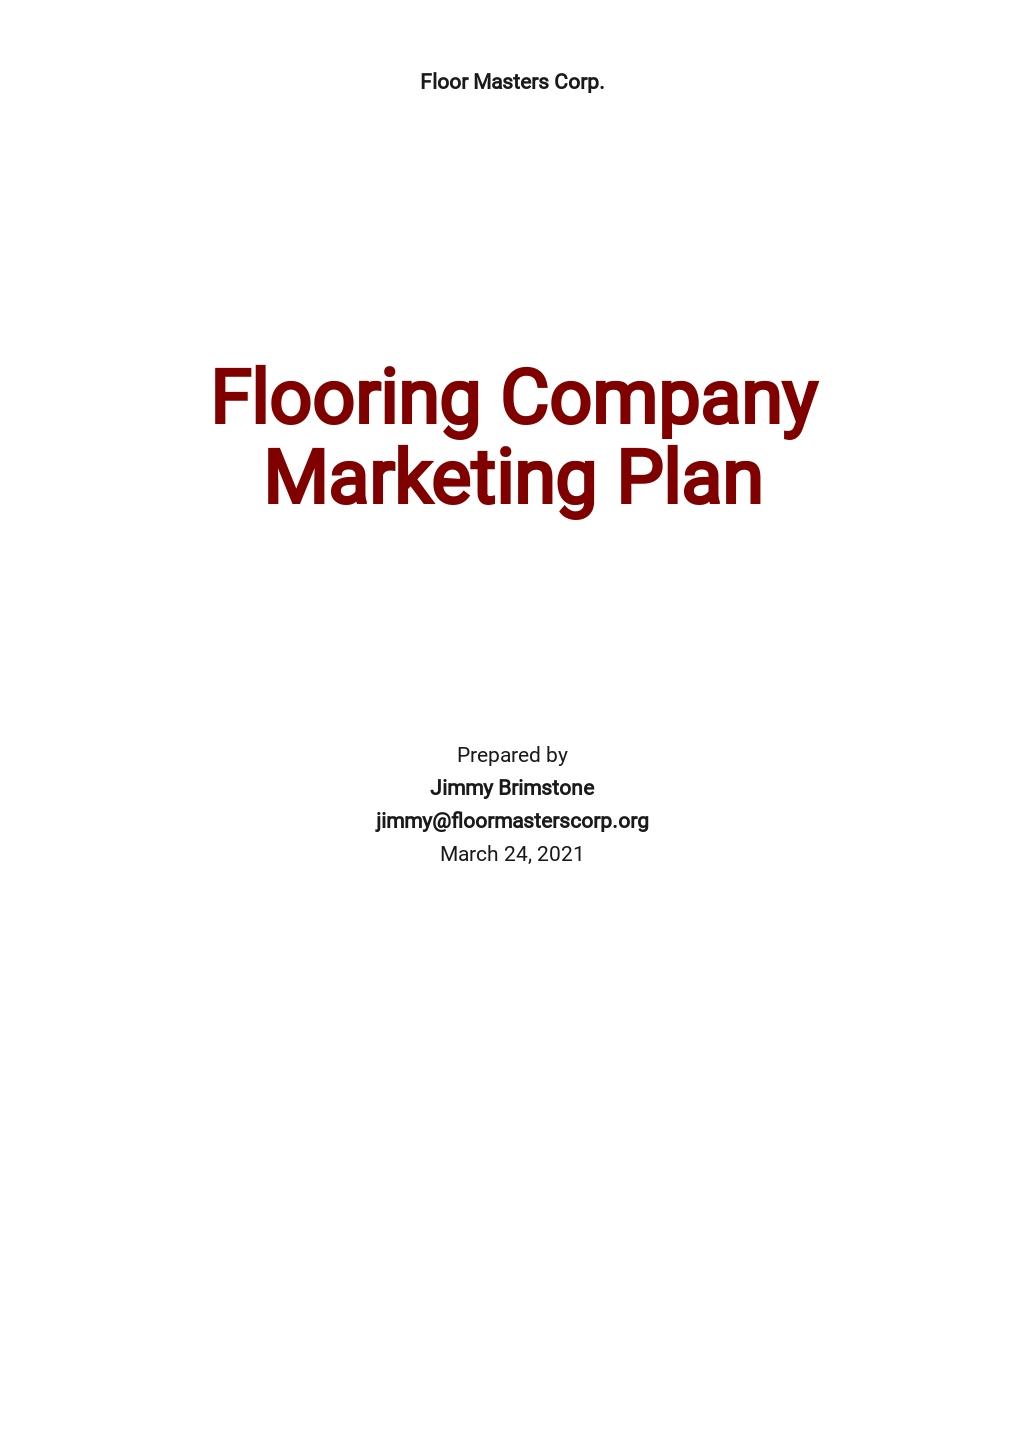 Flooring Company Marketing Plan Template